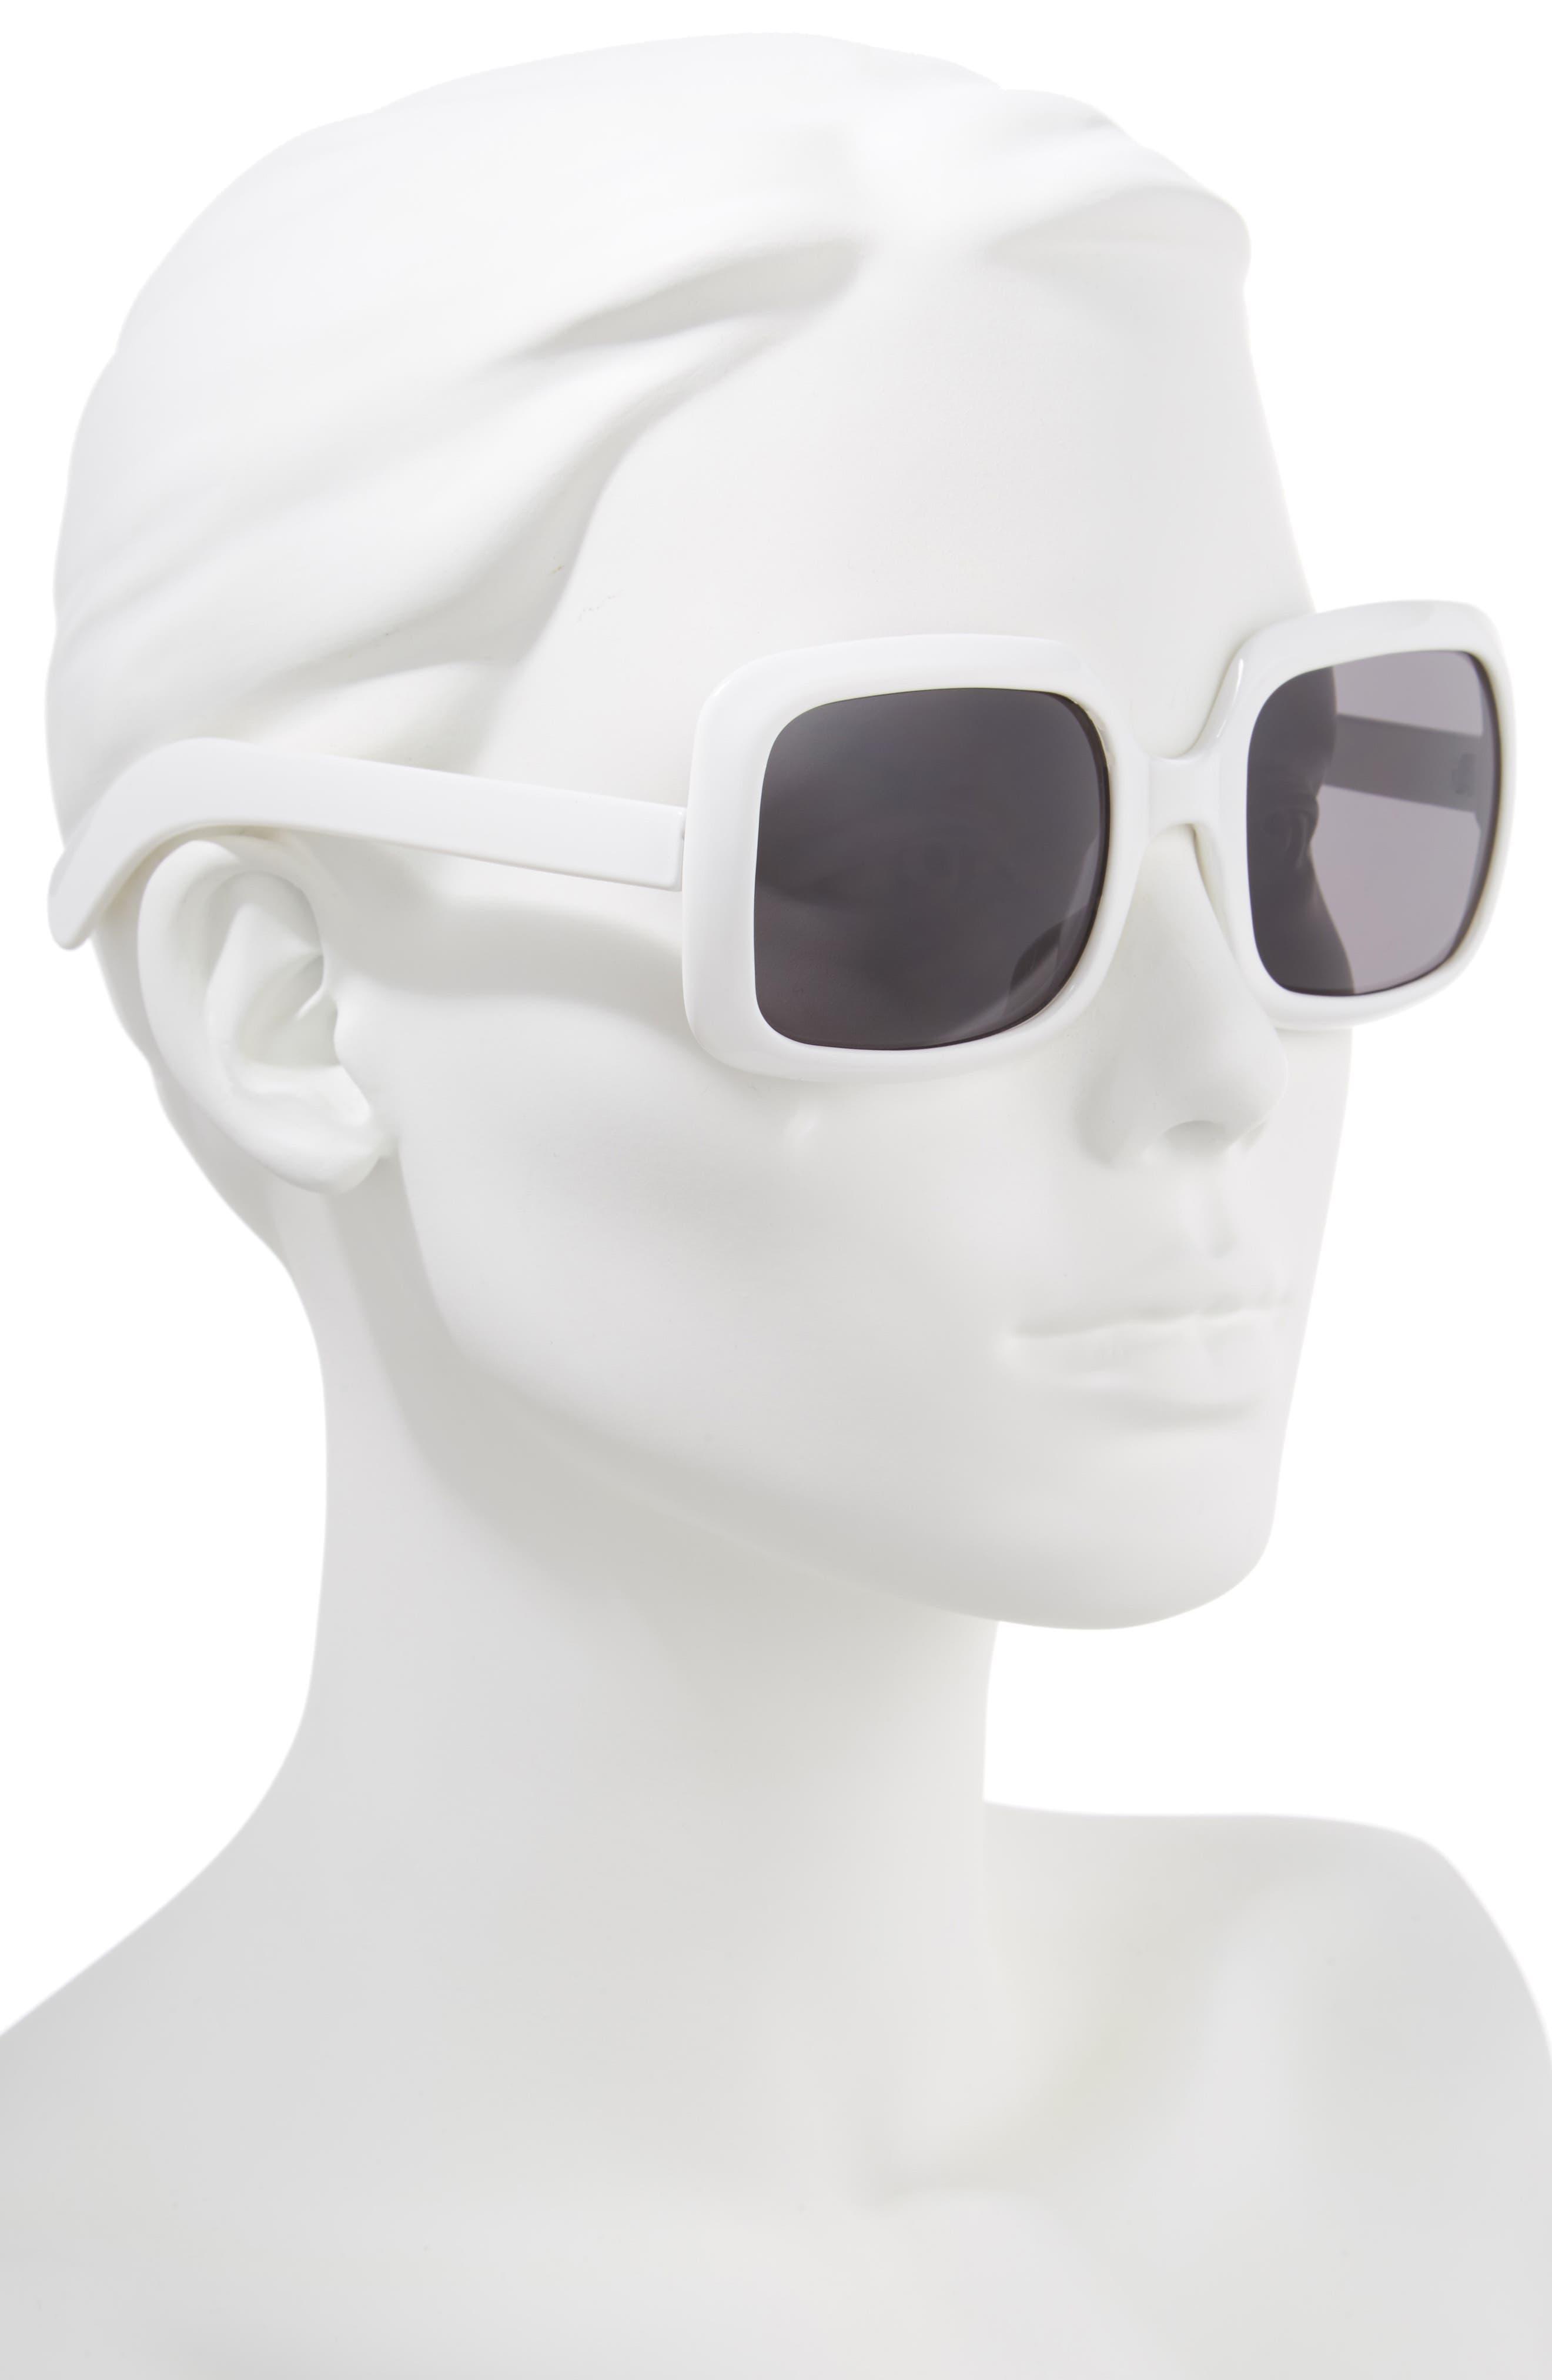 54mm Retro Square Sunglasses,                             Alternate thumbnail 2, color,                             100